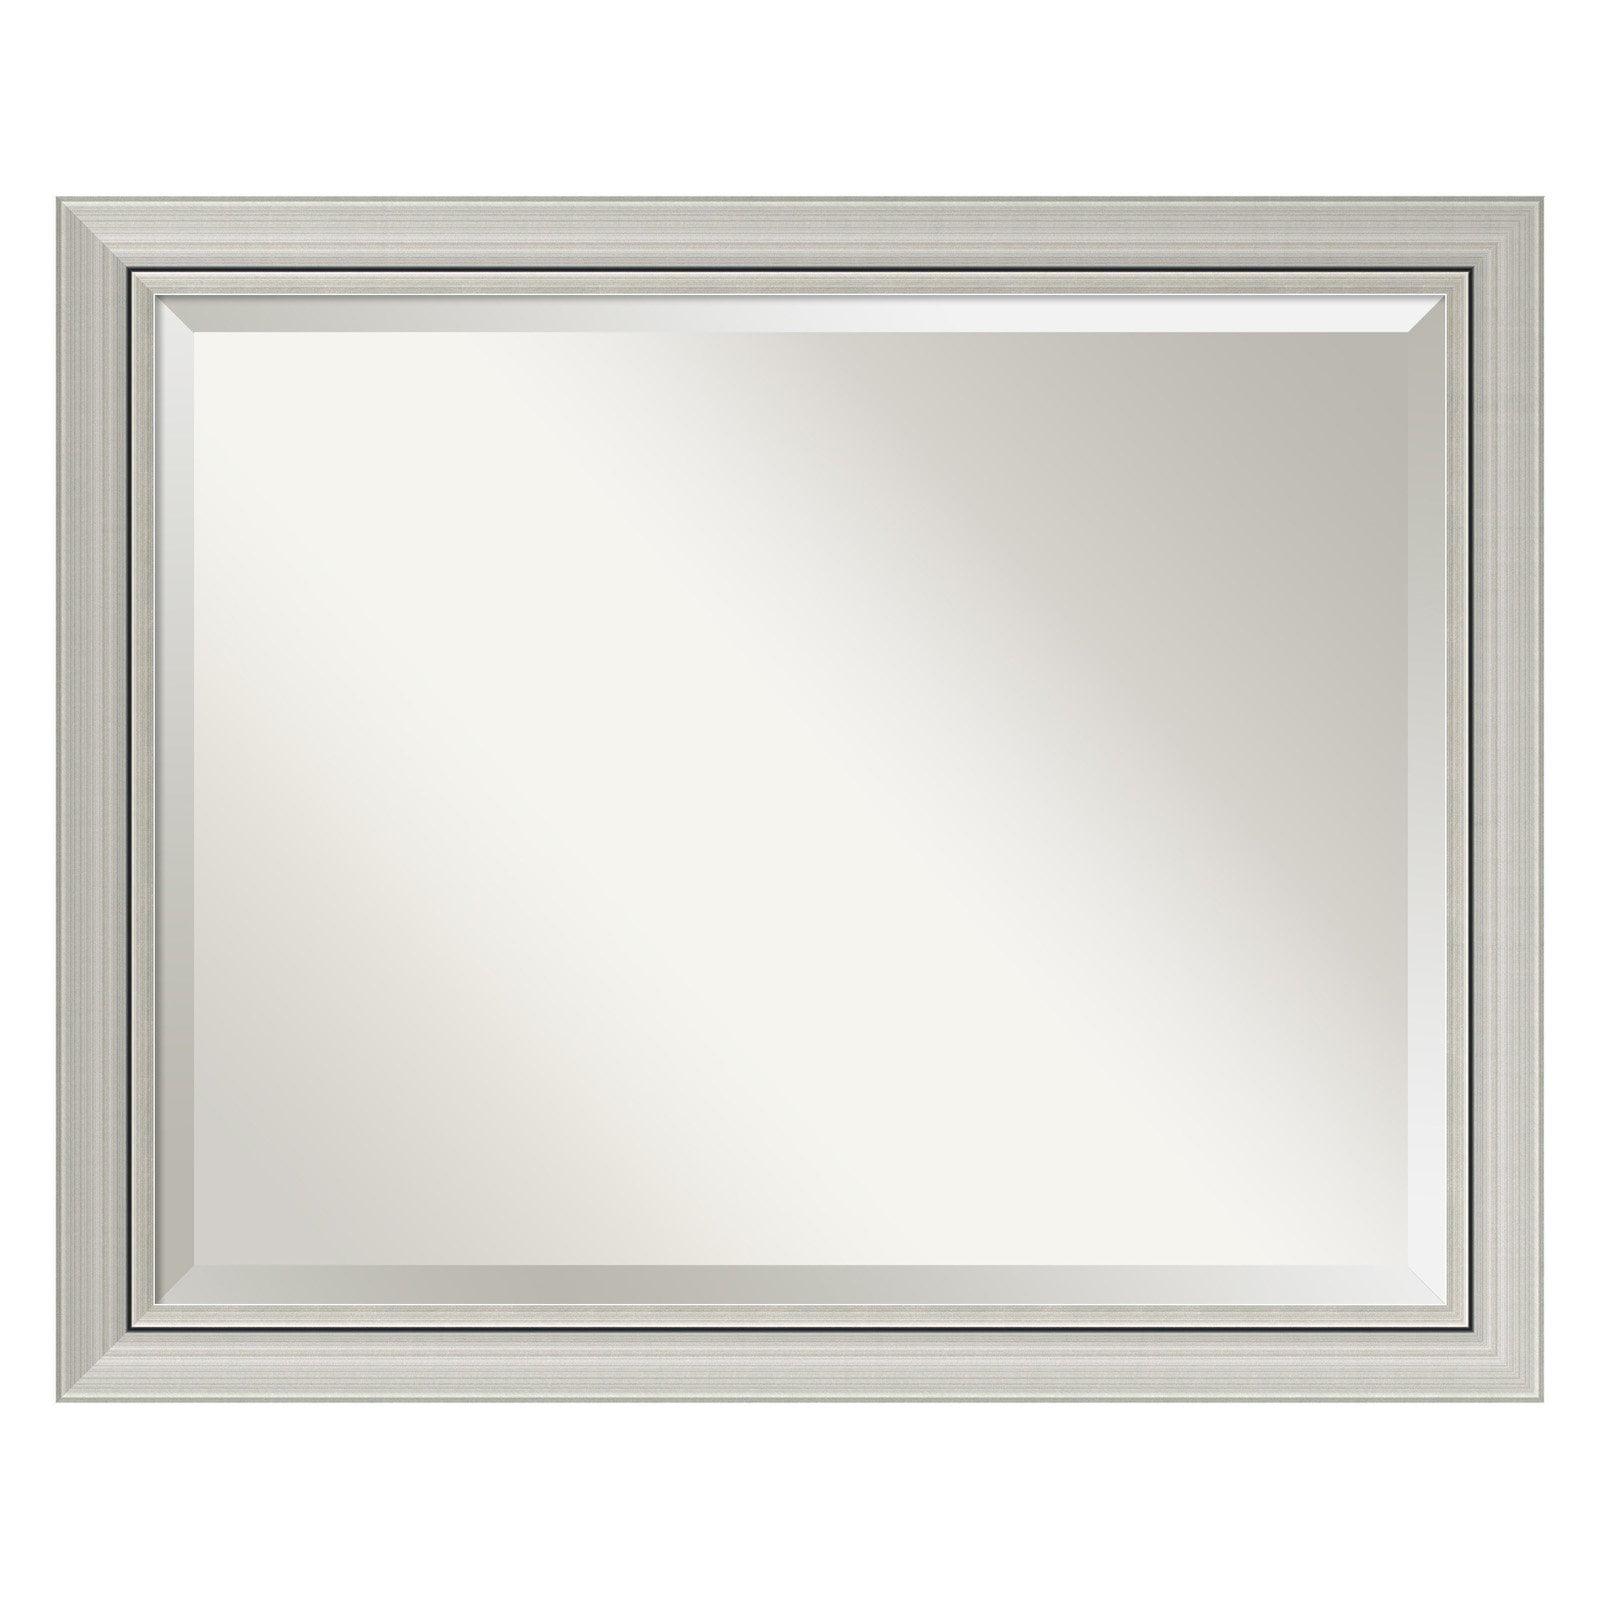 Amanti Art Romano Narrow Bathroom Mirror by Amanti Art